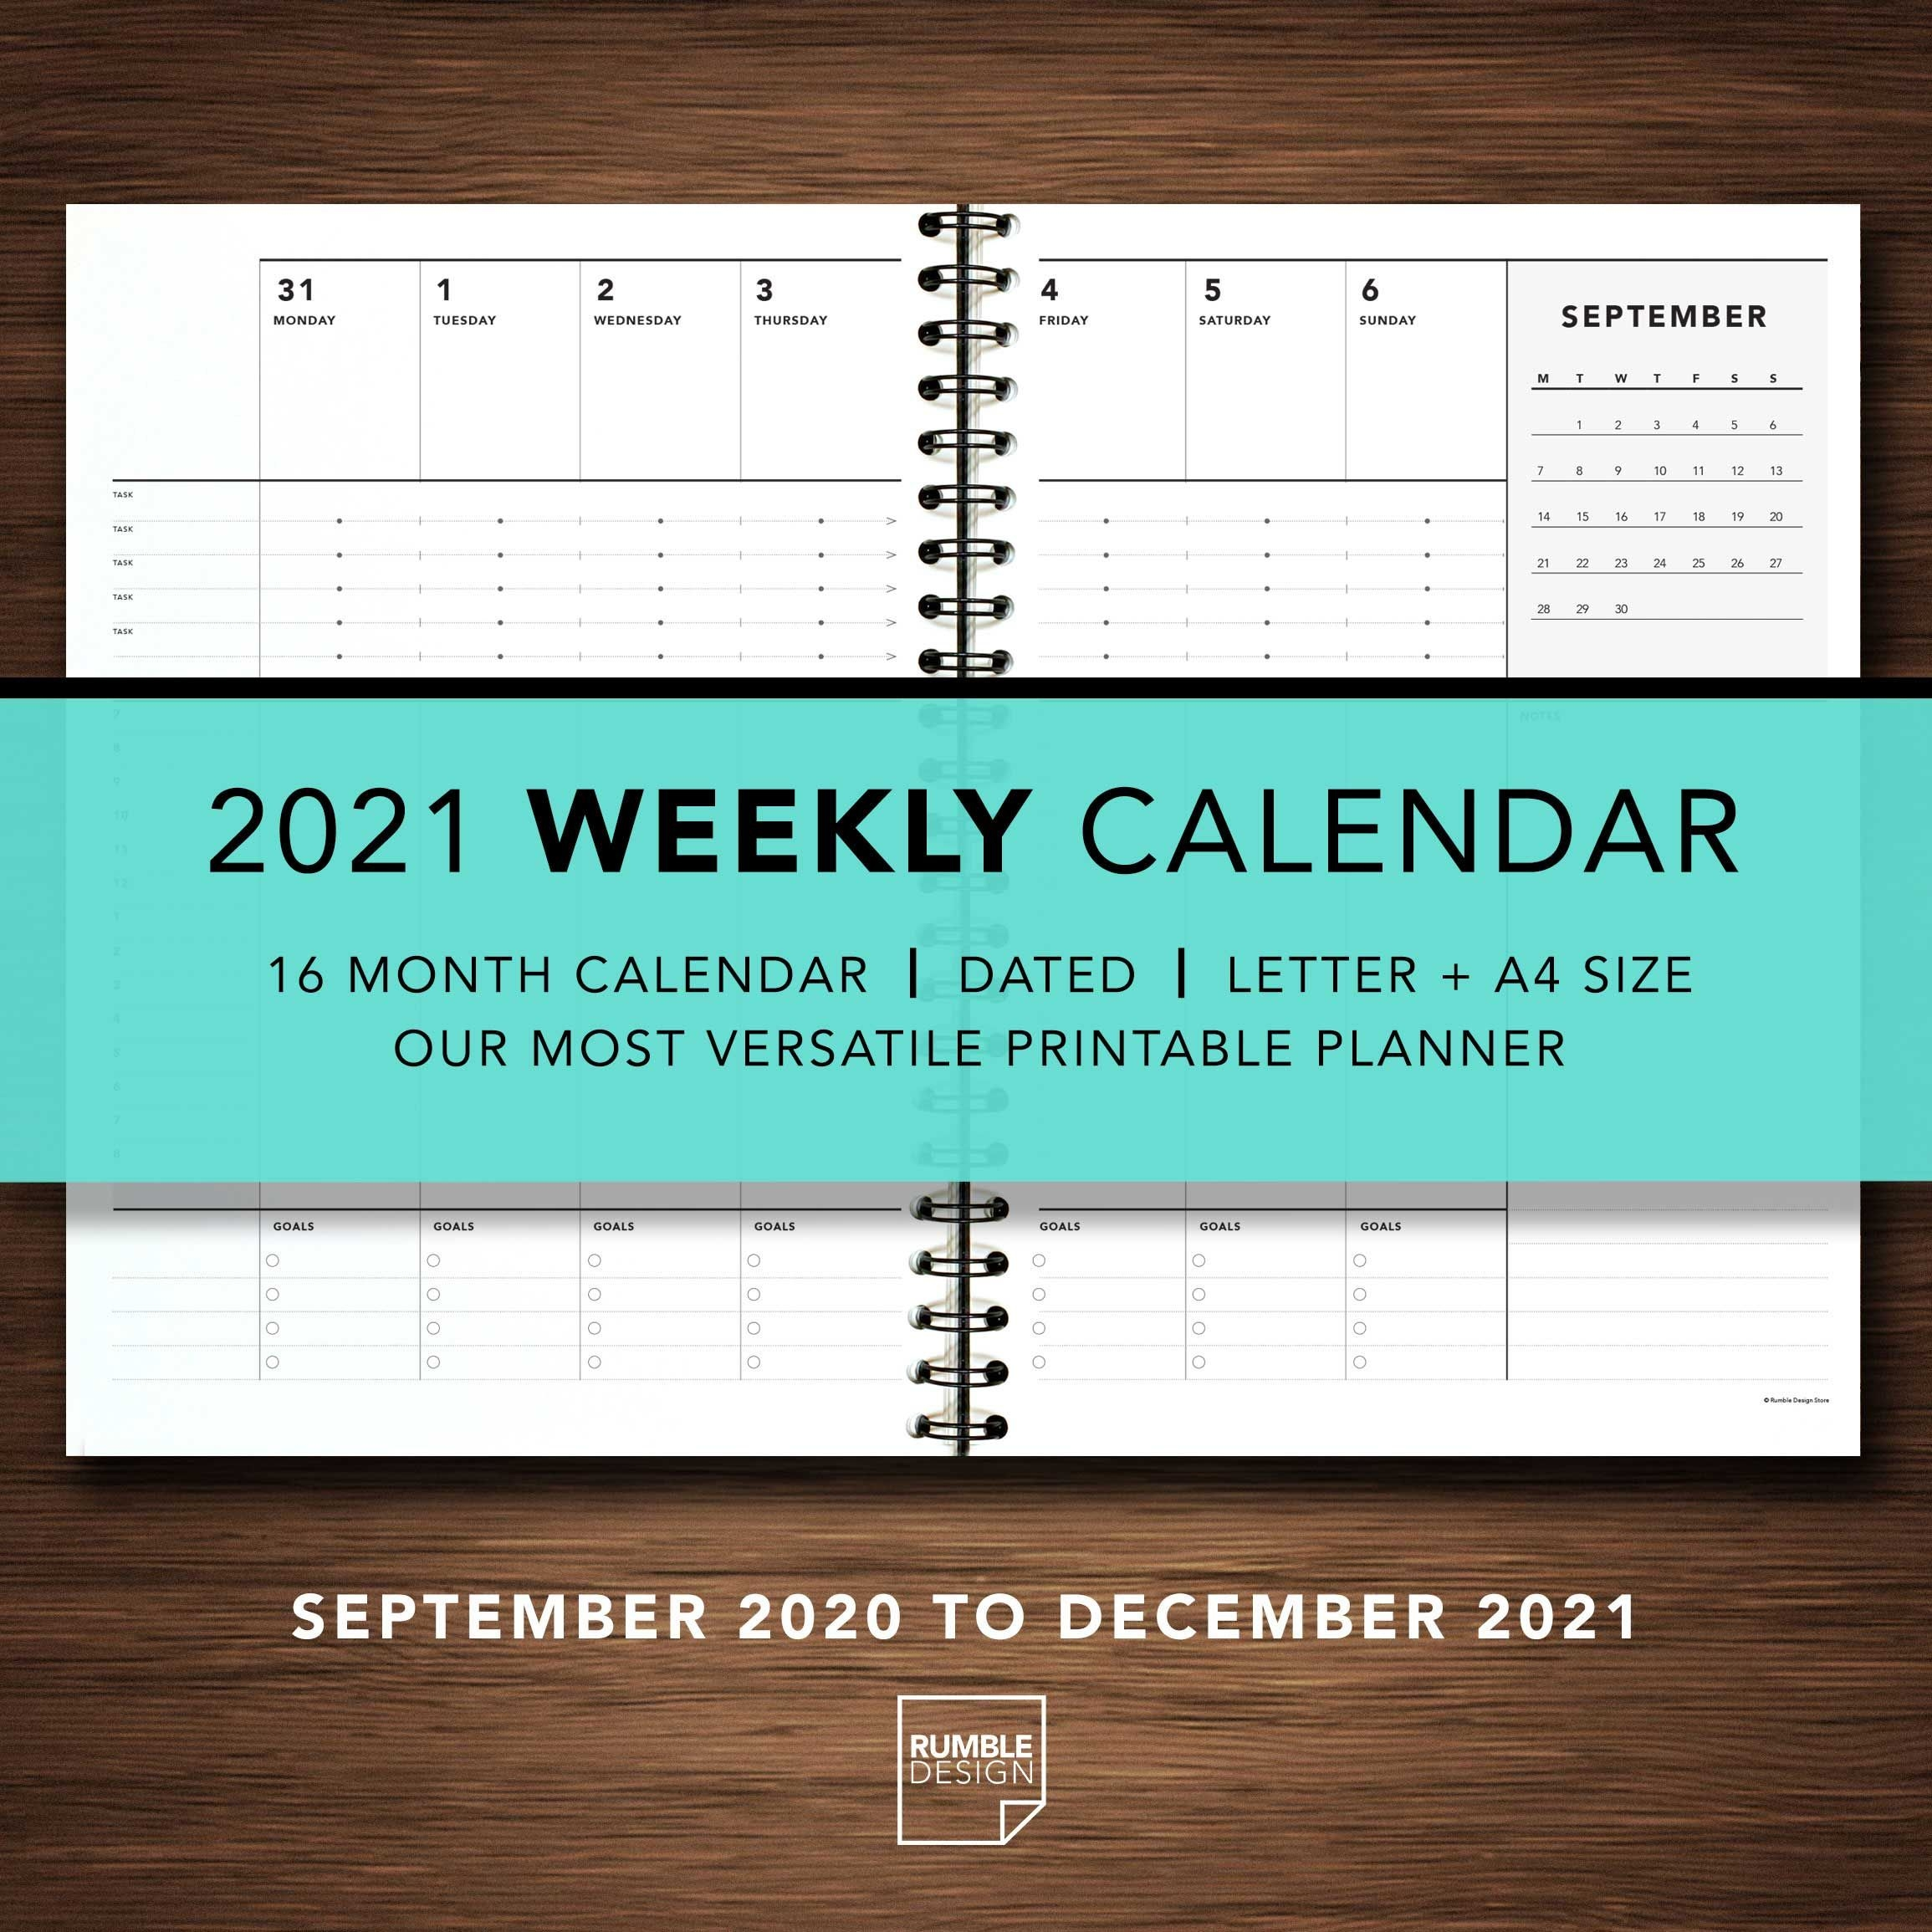 2021 Weekly Calendar | Rumble Design Store